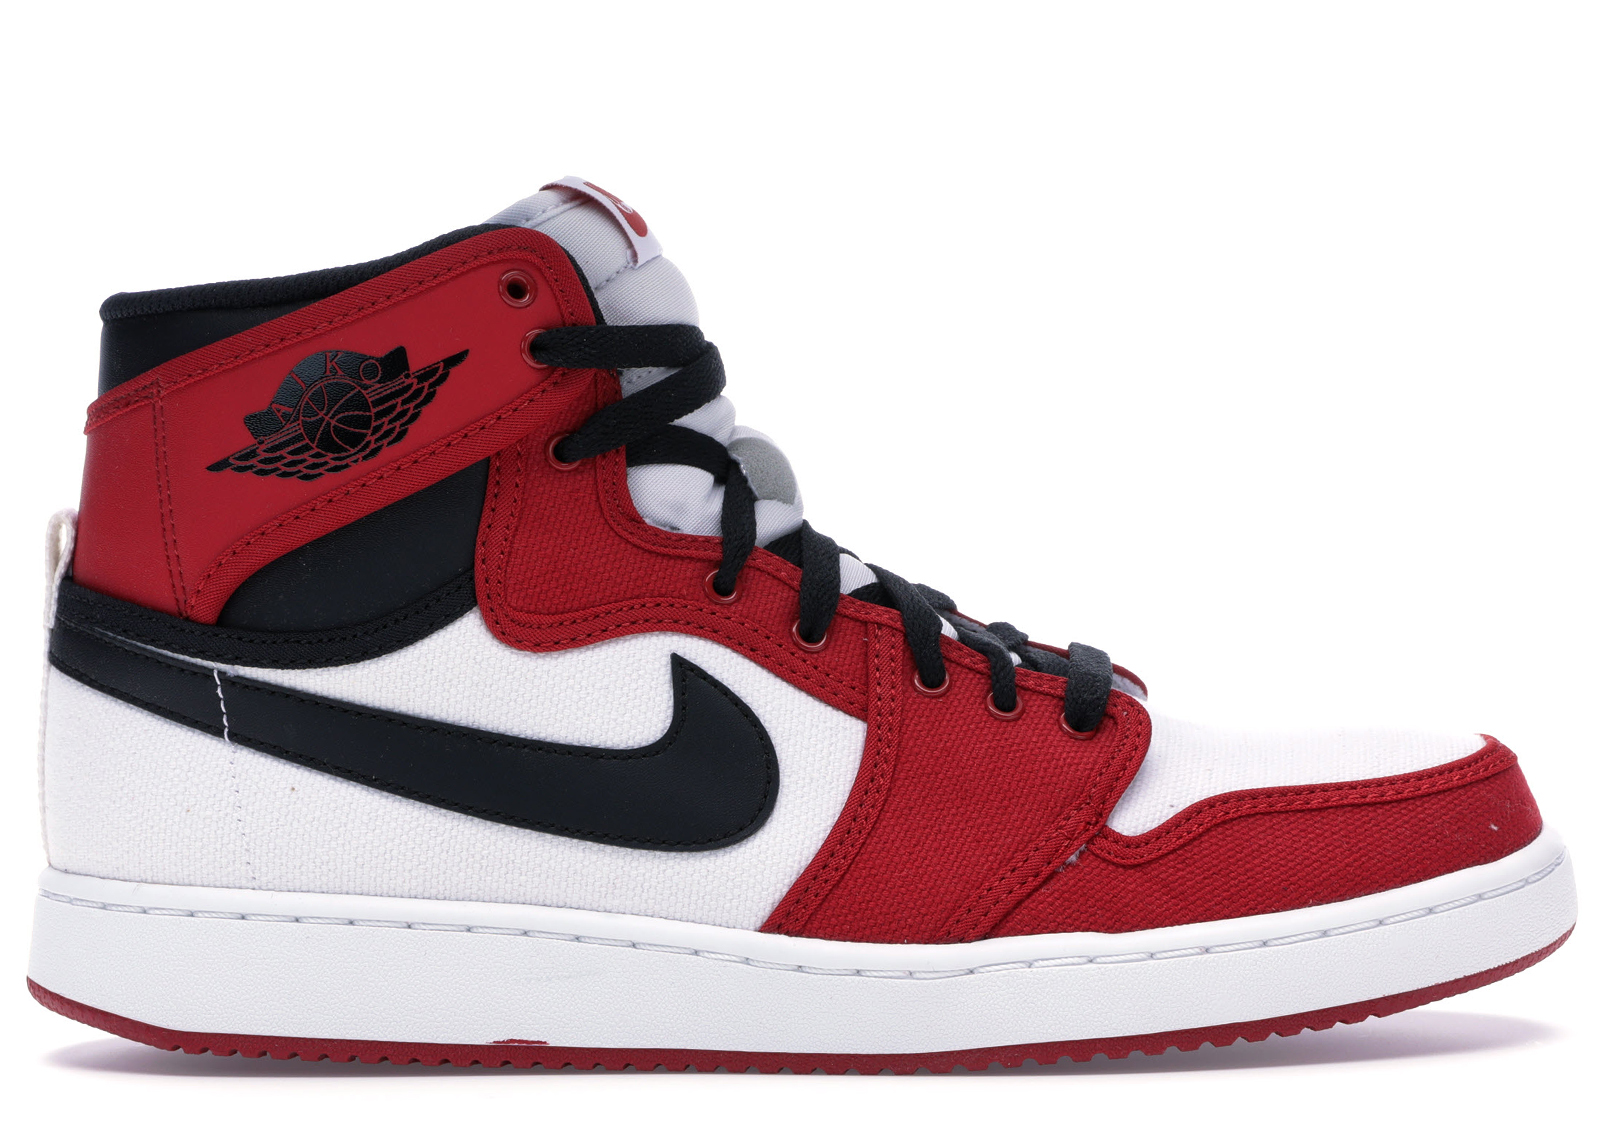 Jordan 1 Retro AJKO Chicago - 638471-101